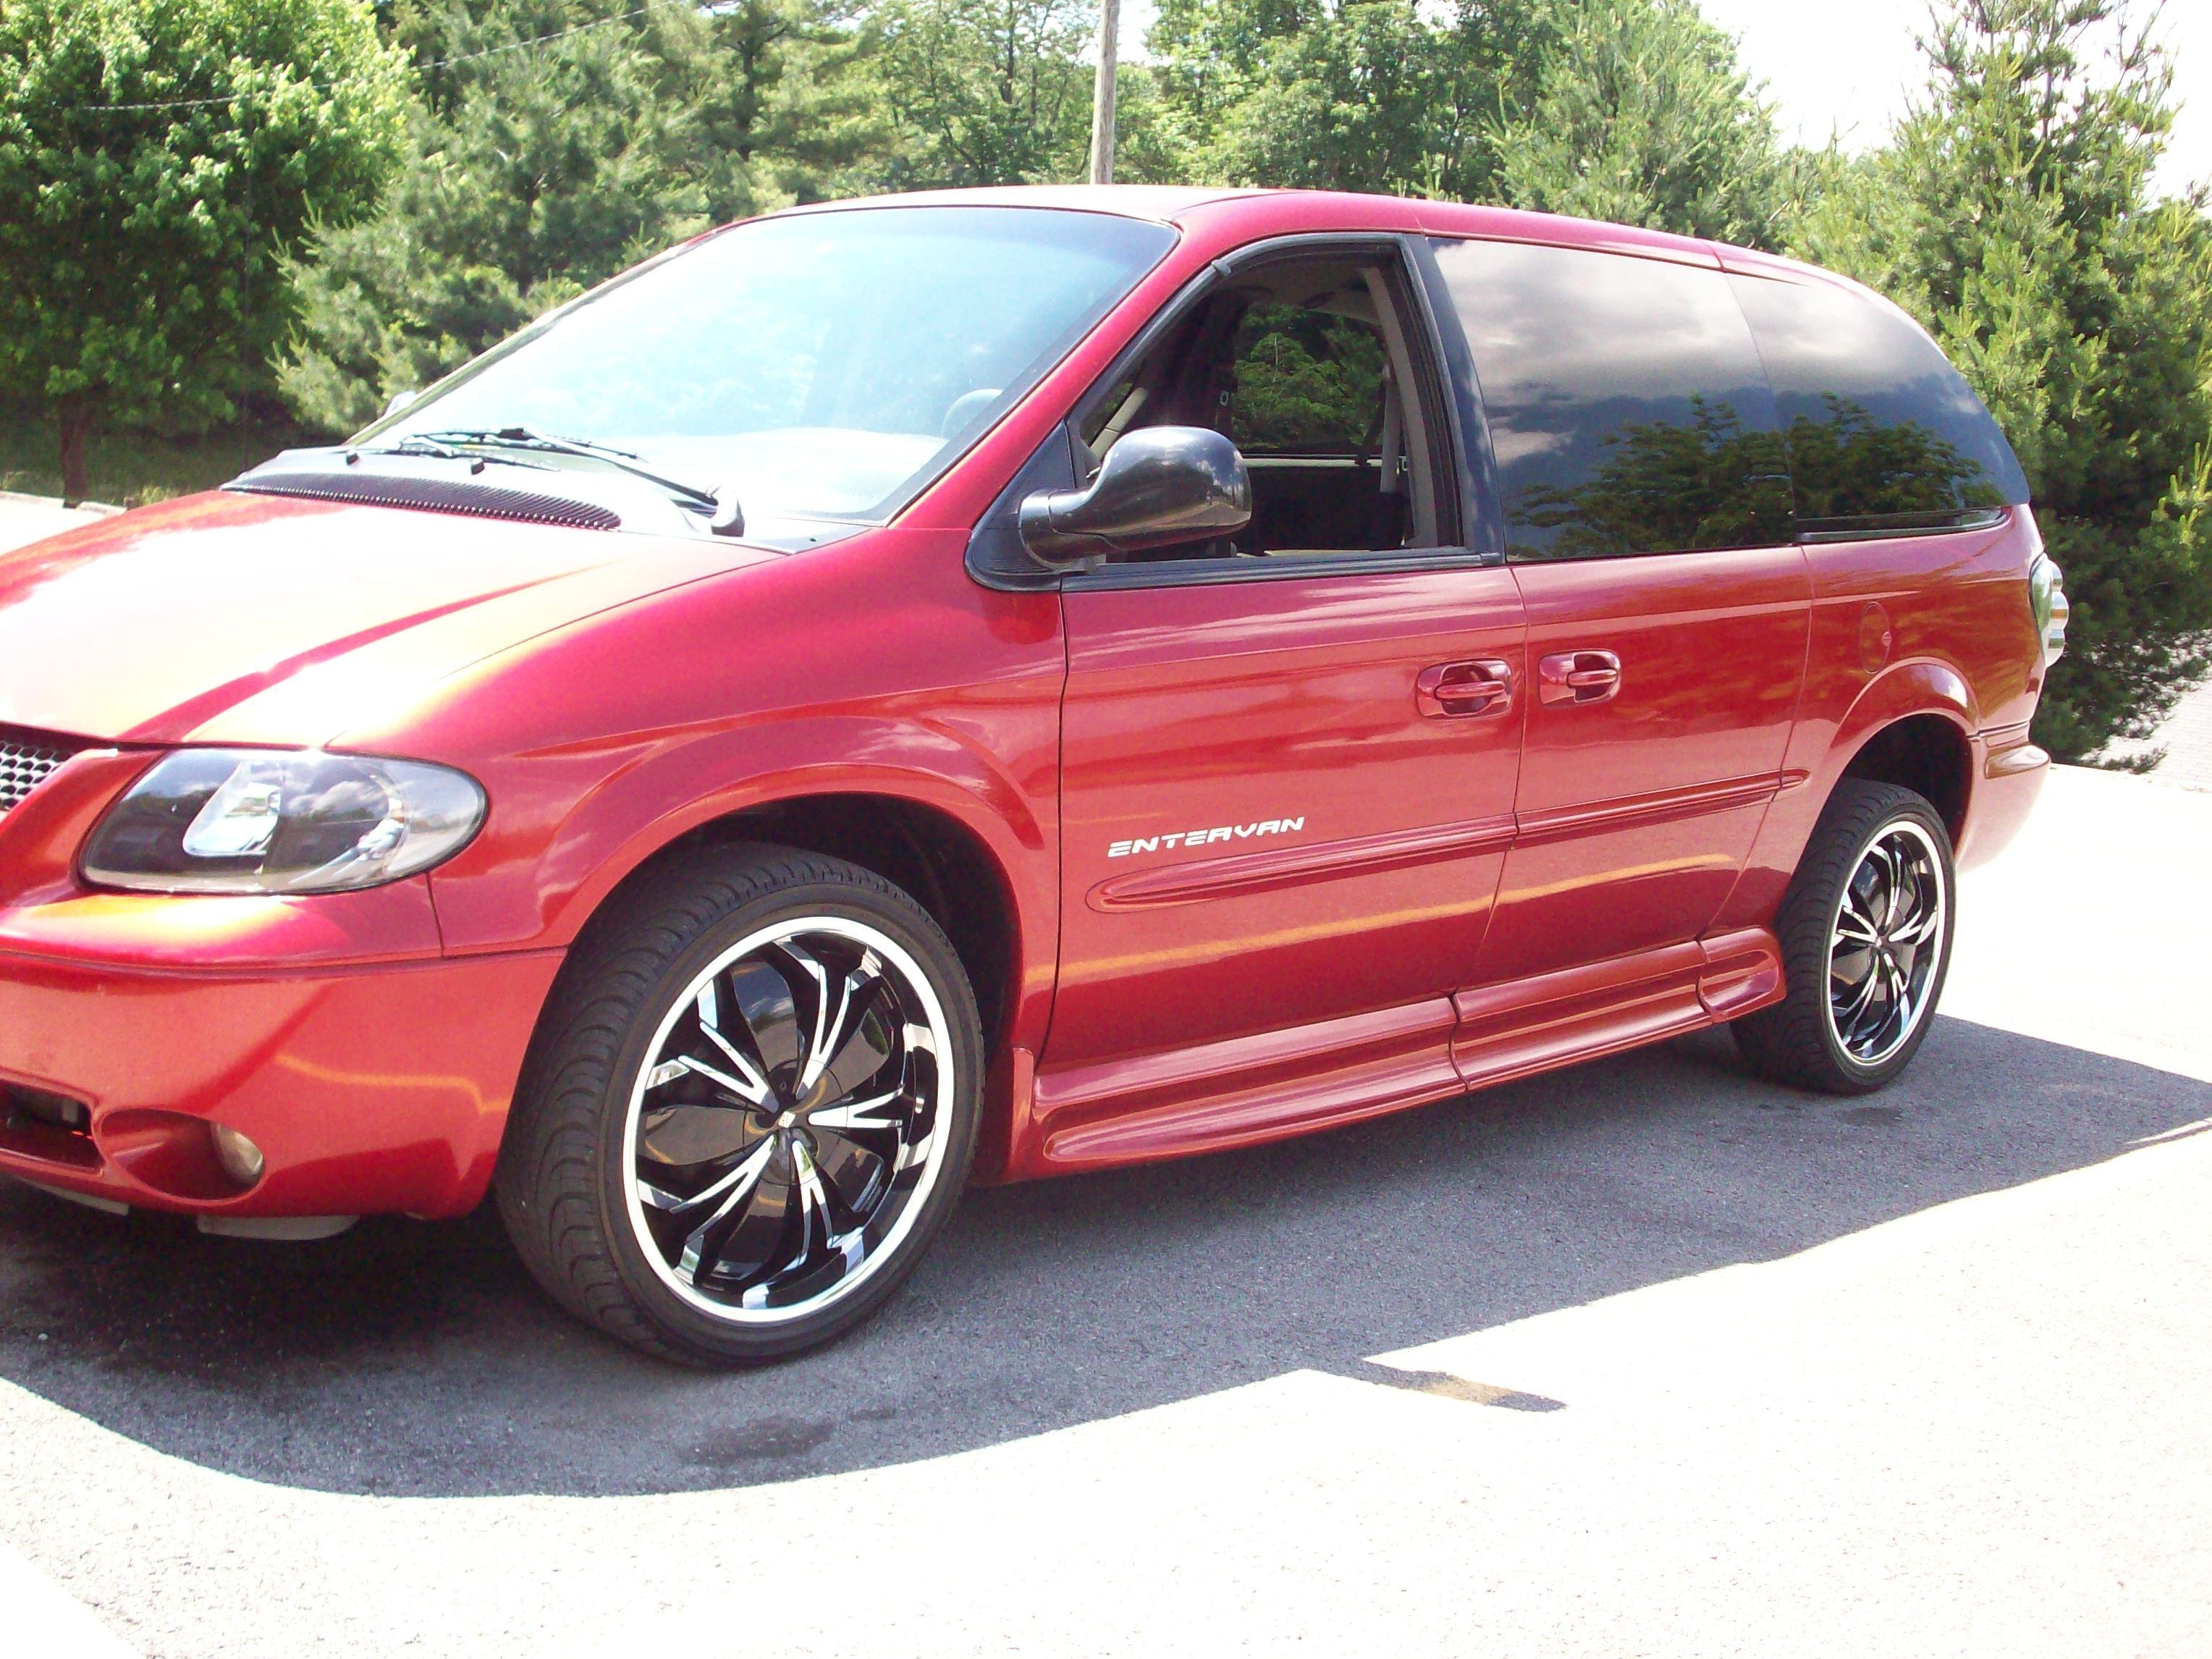 2001 Chrysler Grand Voyagerchrysler Voyager Tuning Youtube 2002 Dodge Caravan Image 12